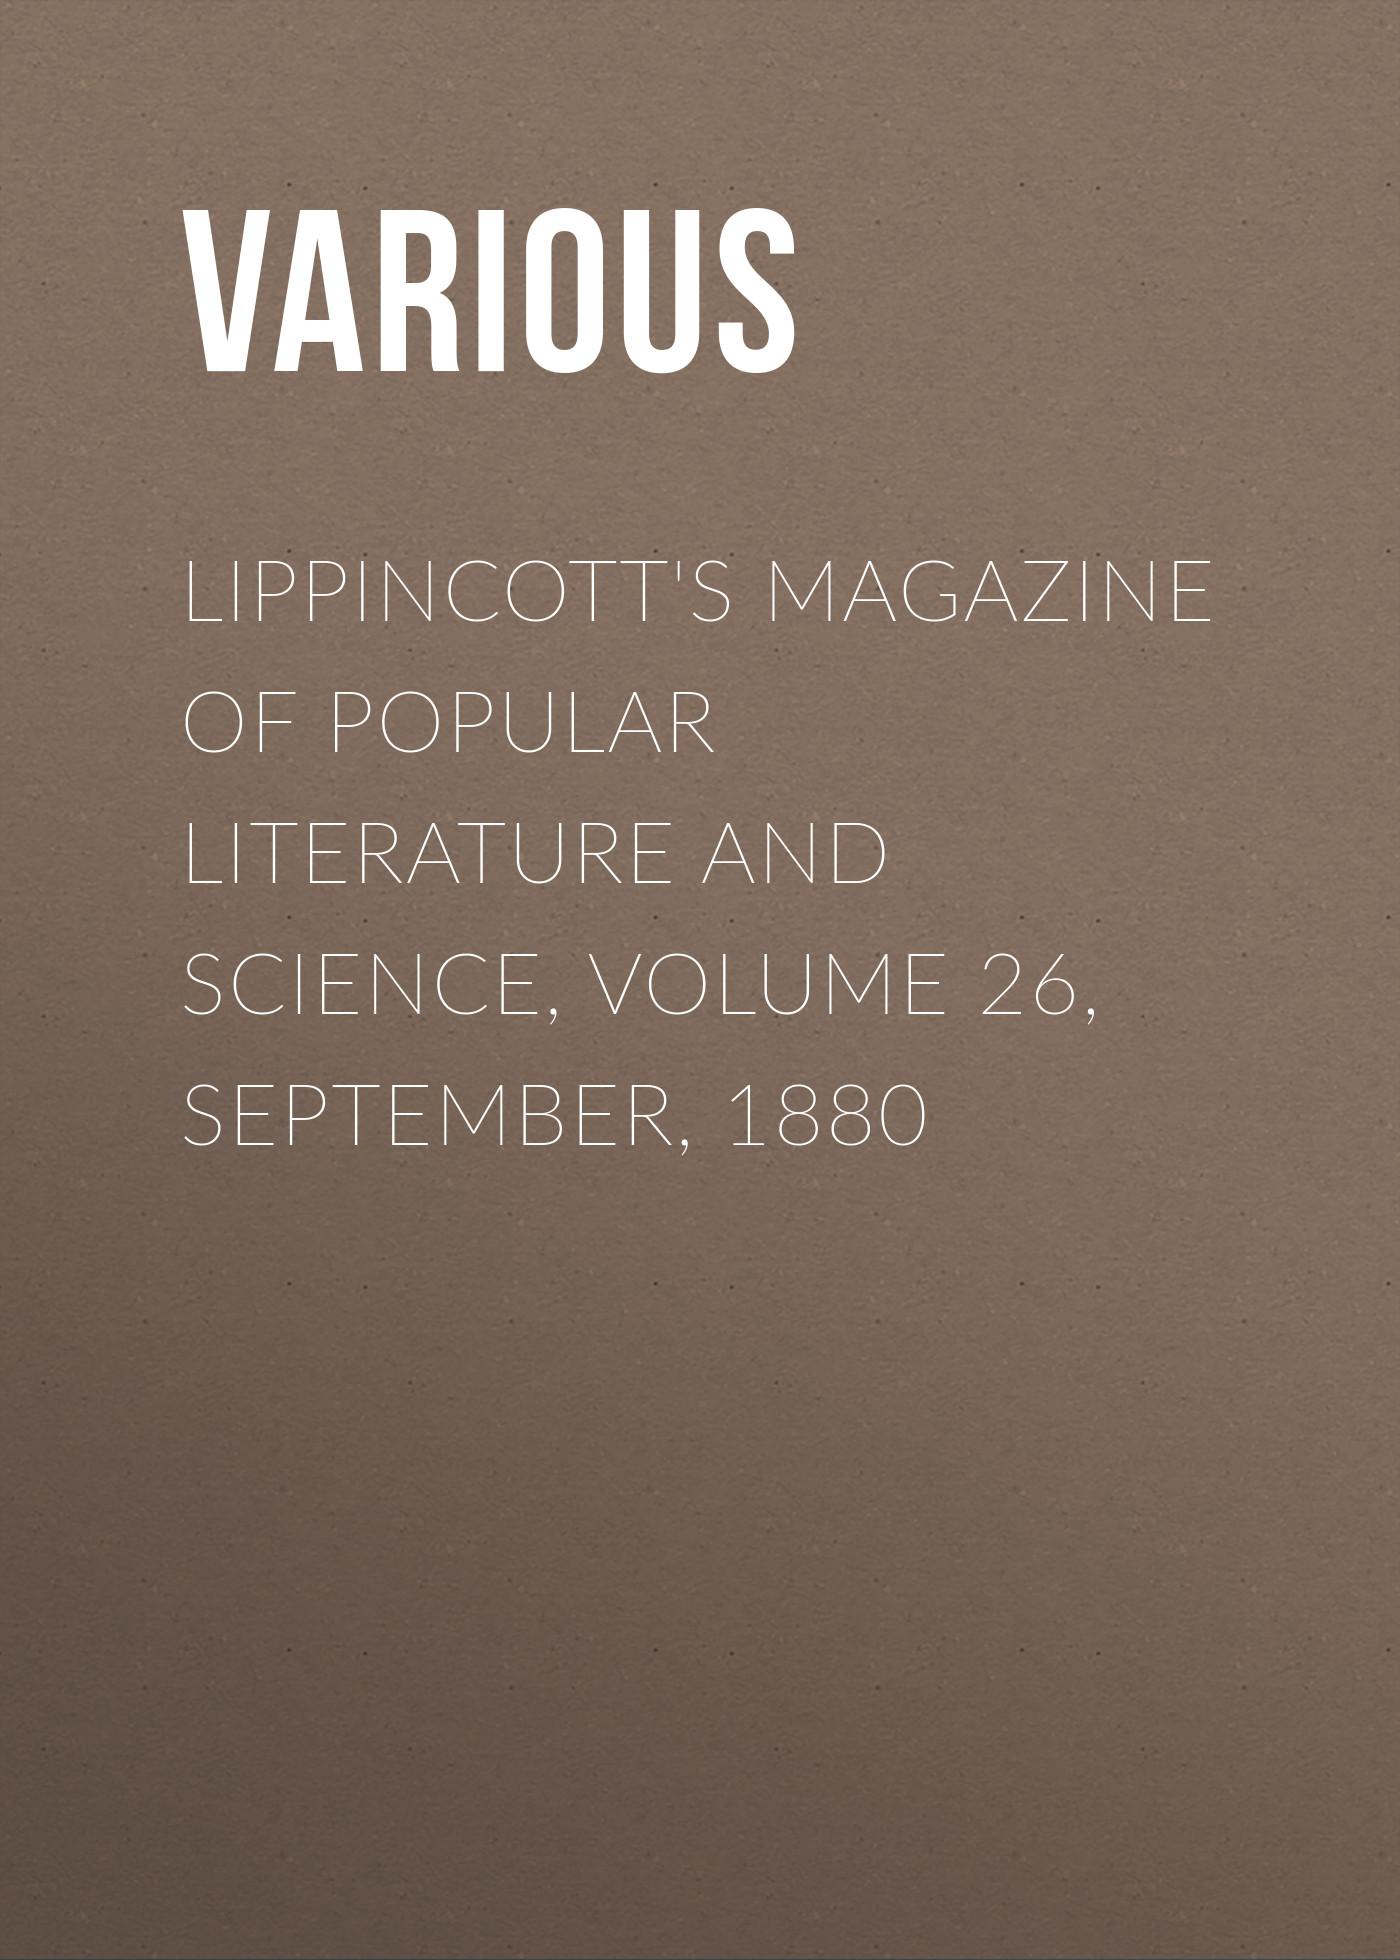 Various Lippincott's Magazine of Popular Literature and Science, Volume 26, September, 1880 various lippincott s magazine of popular literature and science volume 17 no 102 june 1876